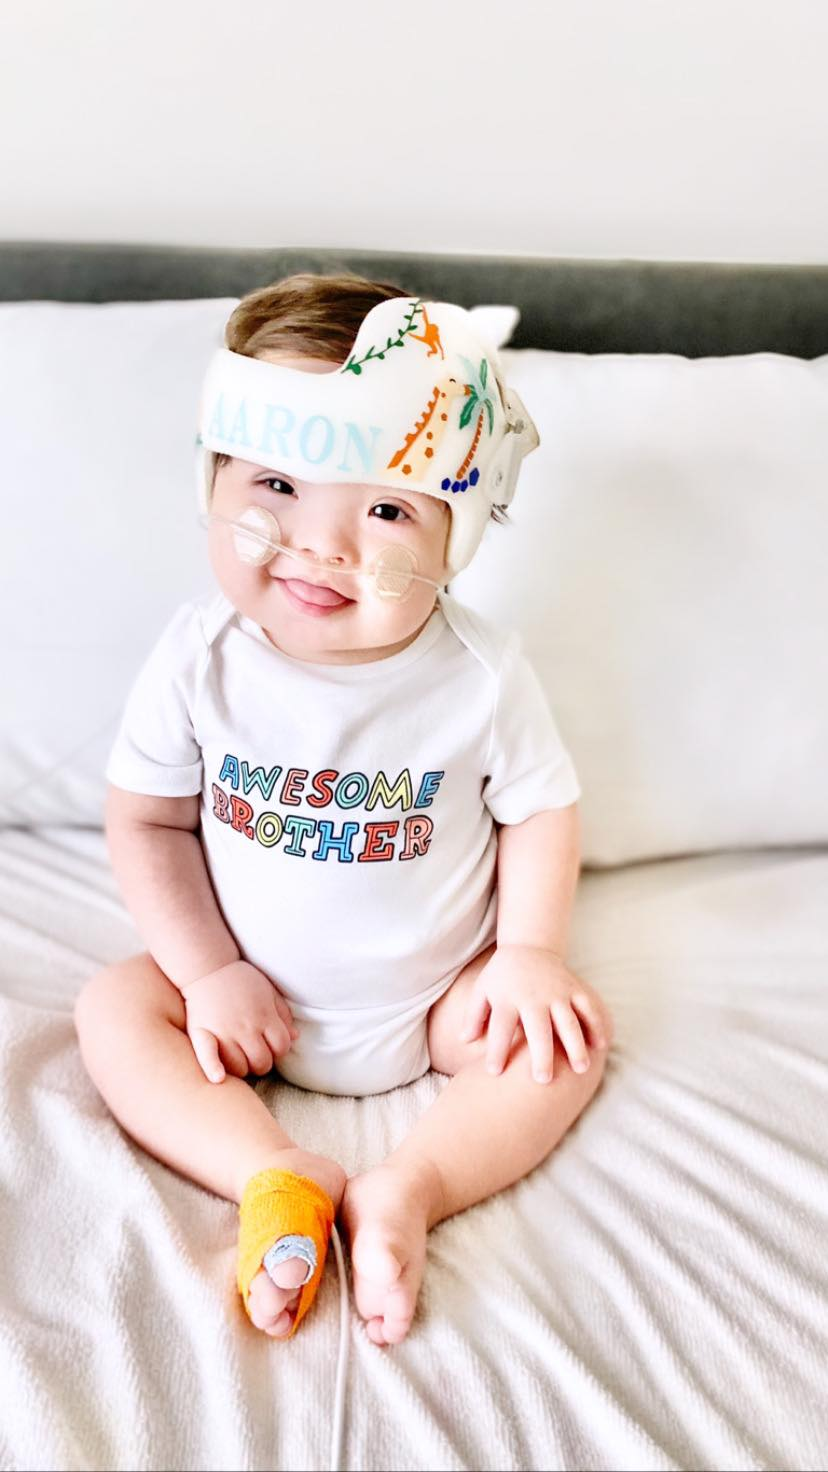 Down syndrome Awareness Month : Payton